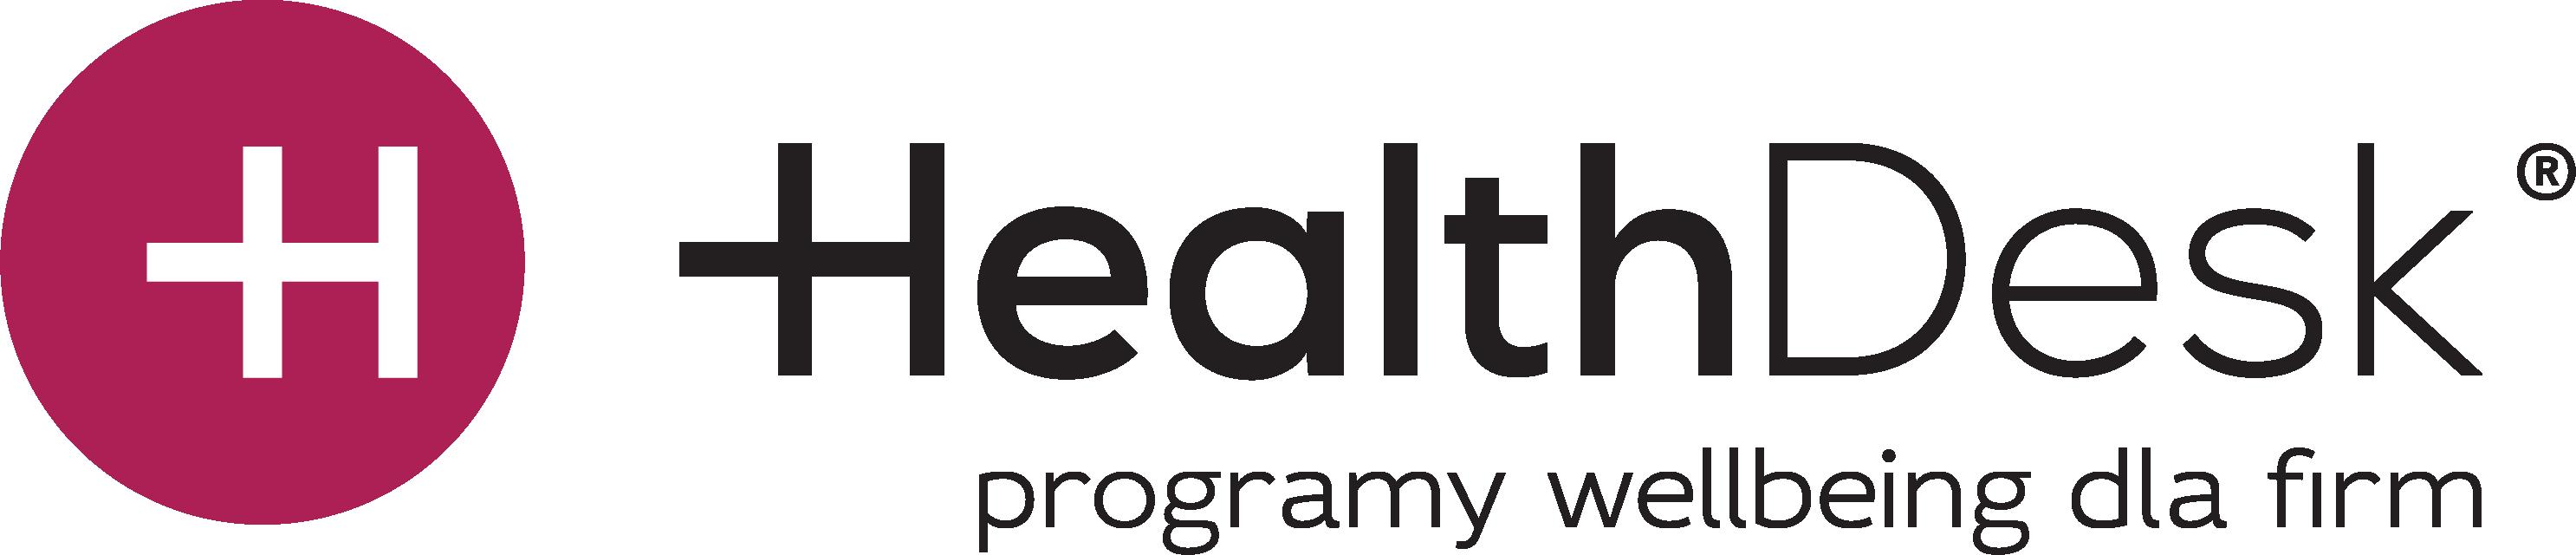 LOGO_HealthDesk_programy_wellbeing_dla_firm_PNG